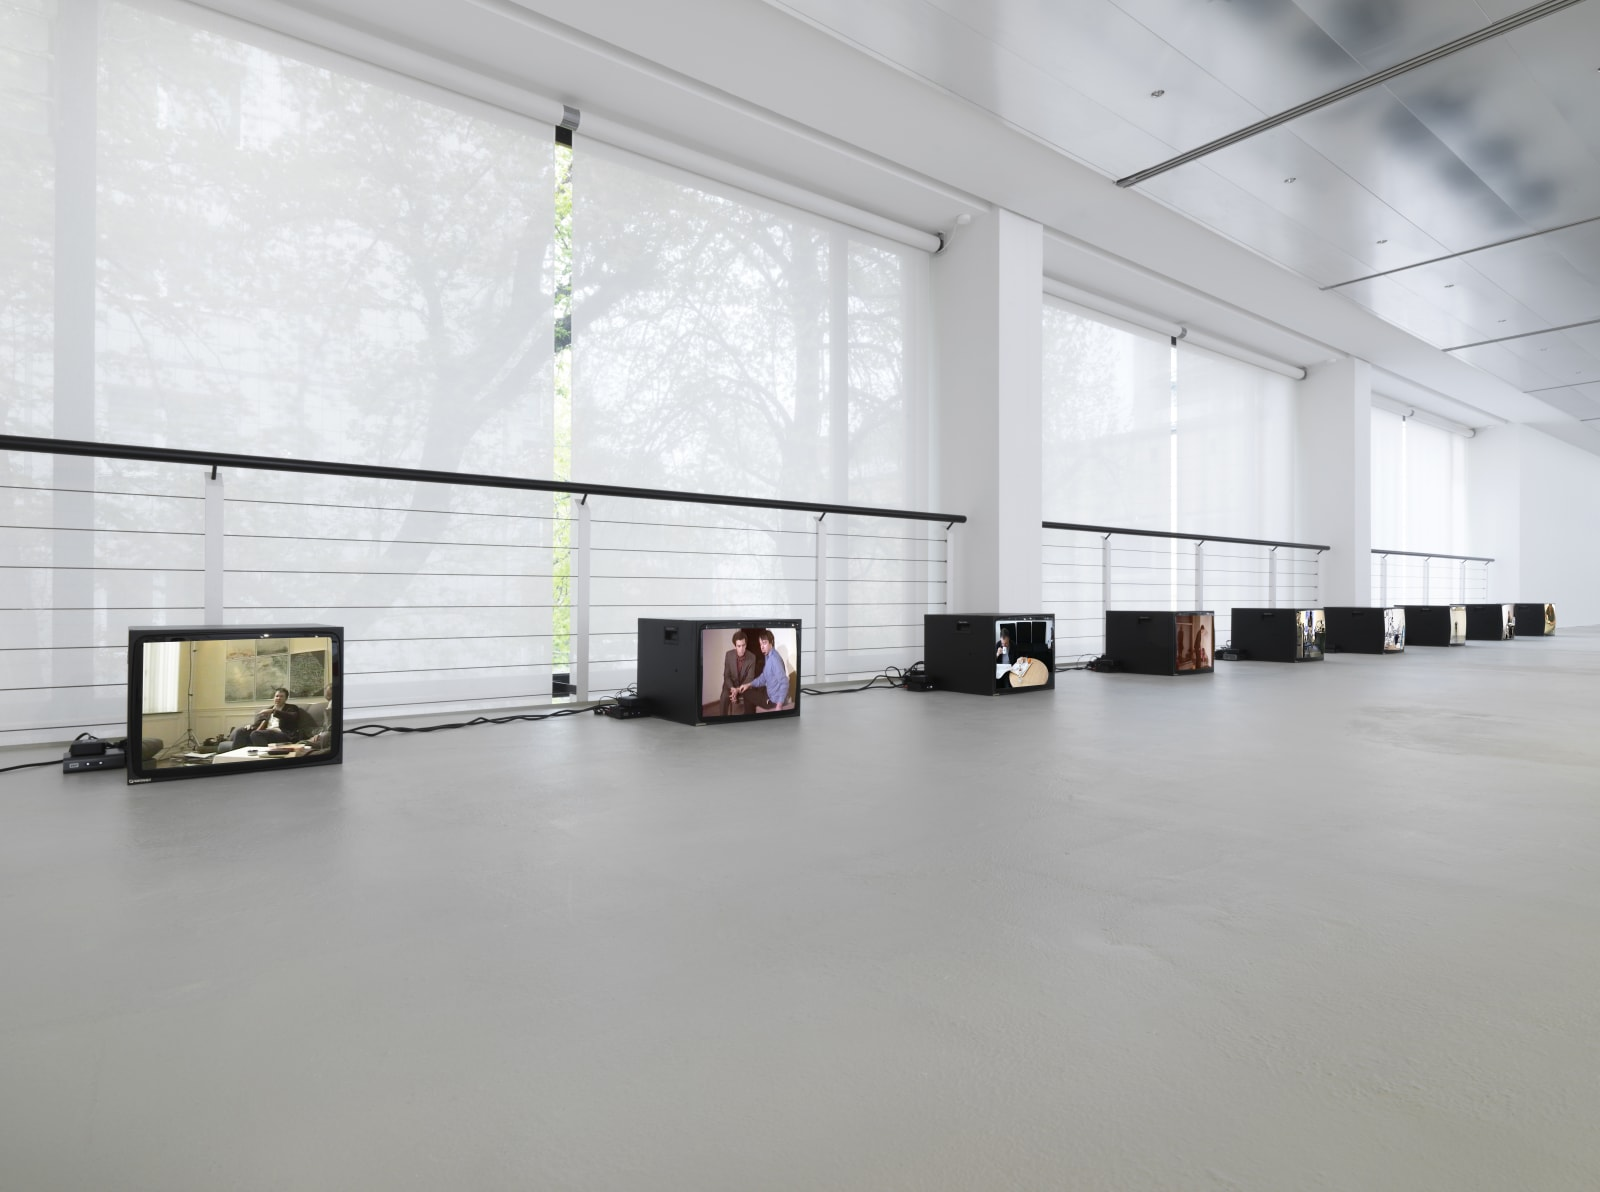 Installation view: Matt Mullican, Five Walls, Capitain Petzel, Berlin, 2021 Ph: Jens Ziehe